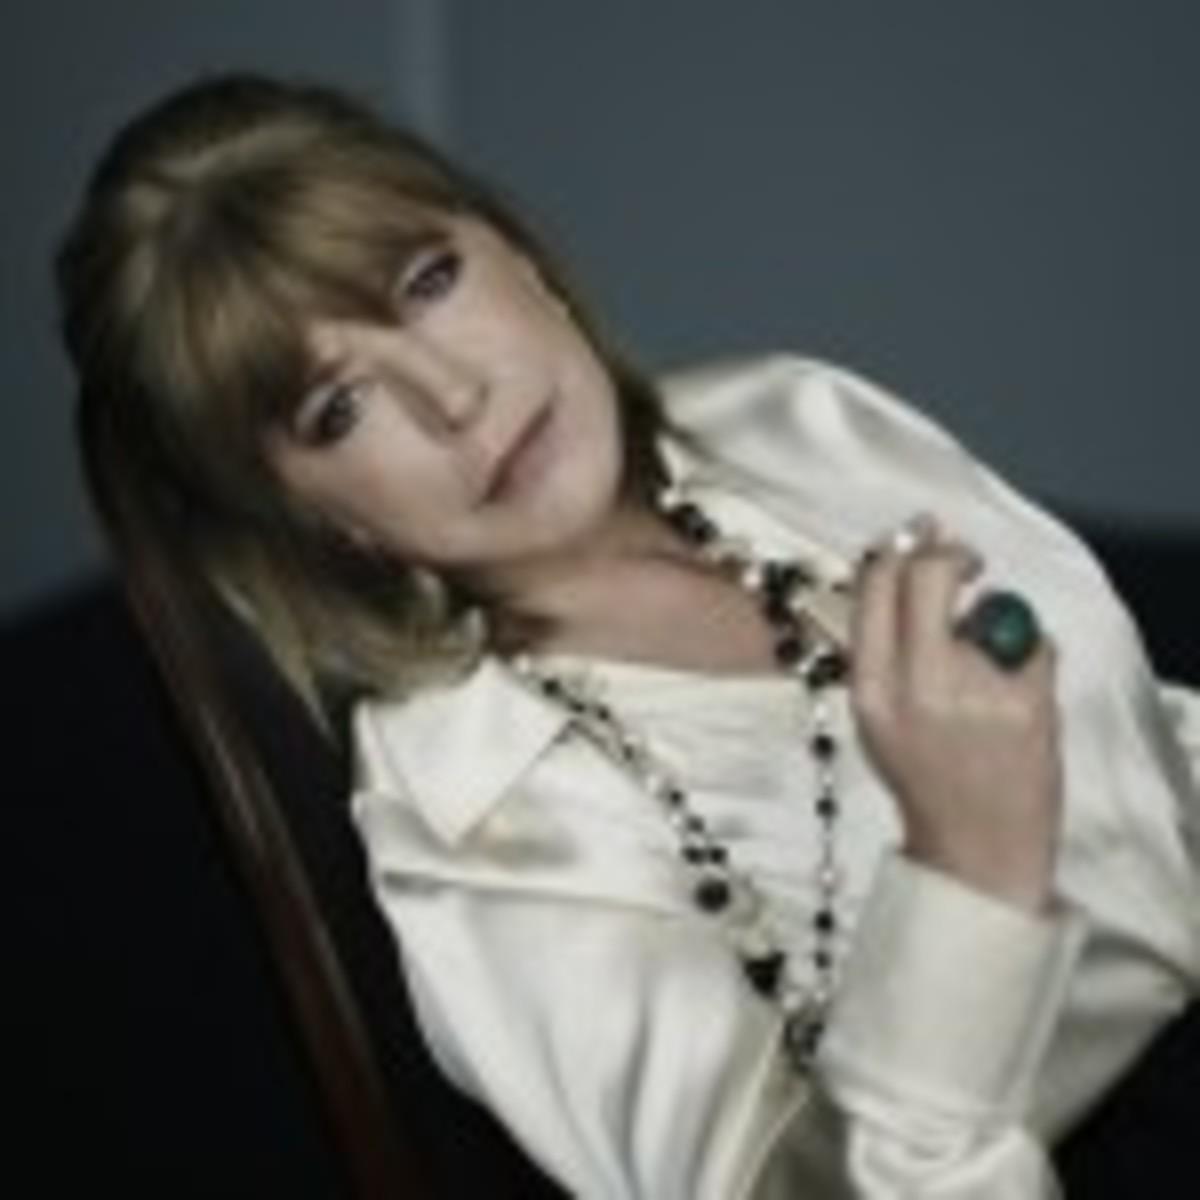 Marianne Faithfull (photo courtesy of Girlie Action)